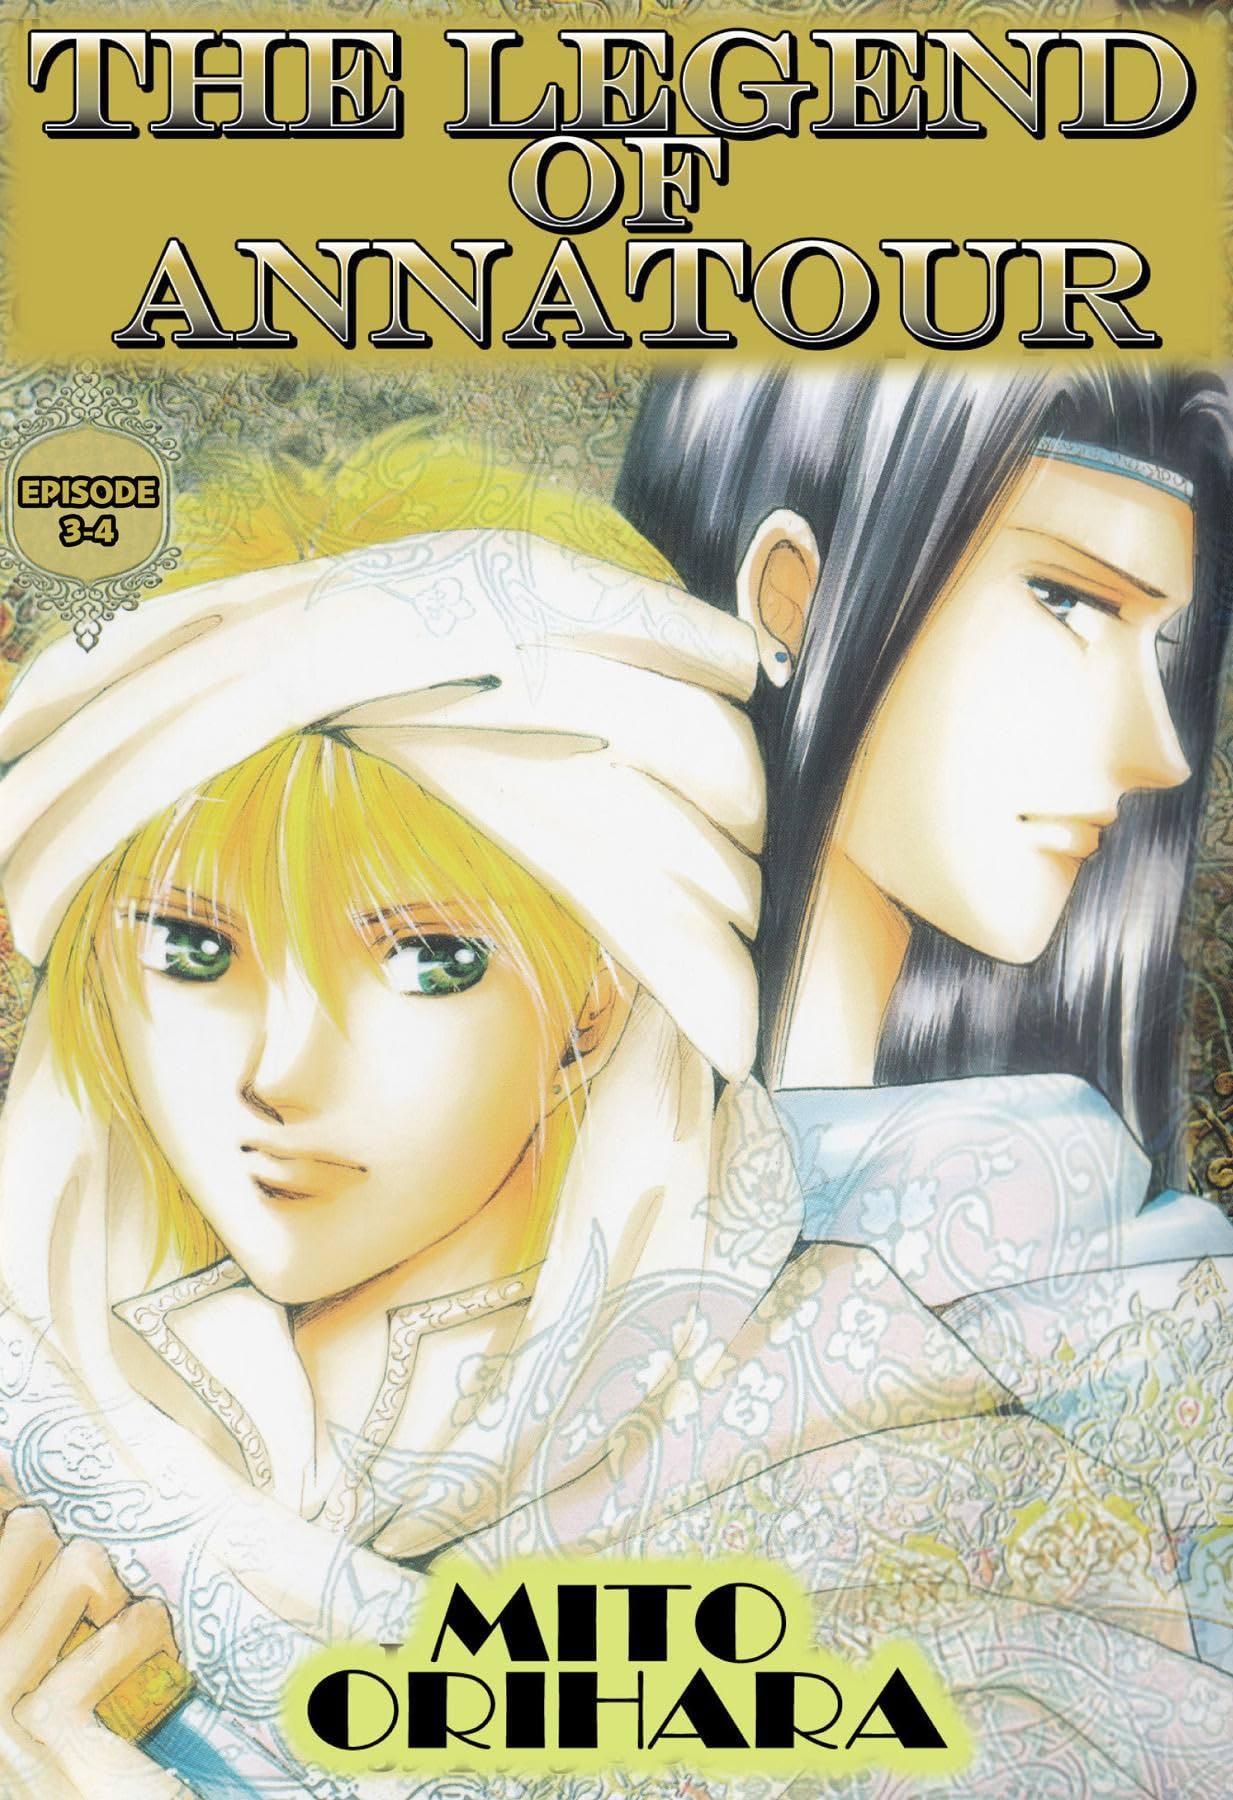 THE LEGEND OF ANNATOUR #18